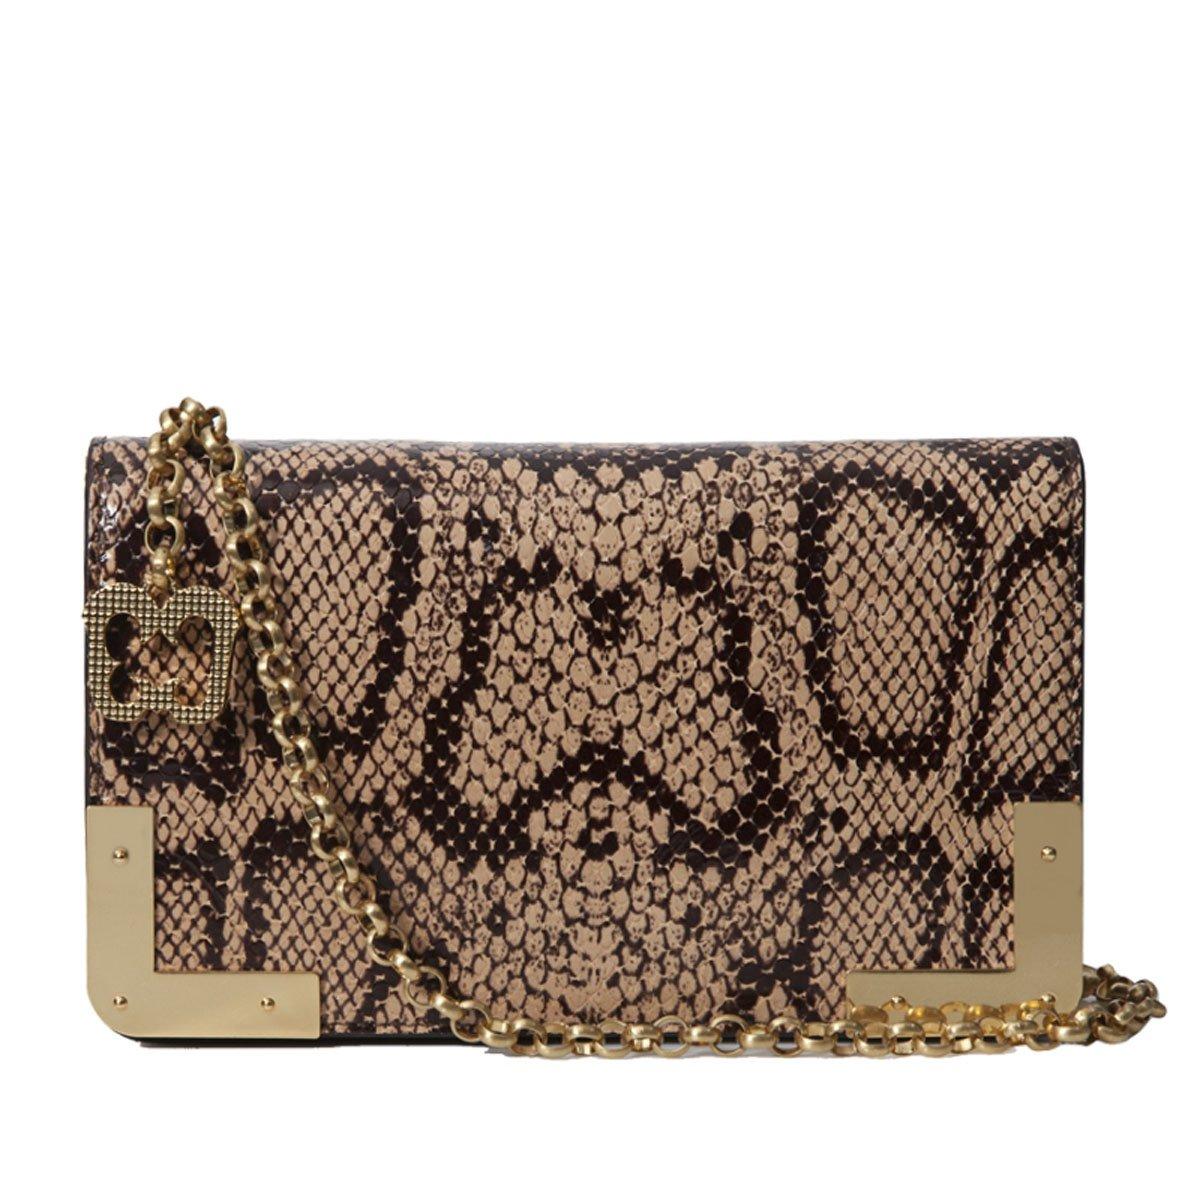 Eric Javits Luxury Fashion Designer Women's Handbag - Cassidy - Beige Mix